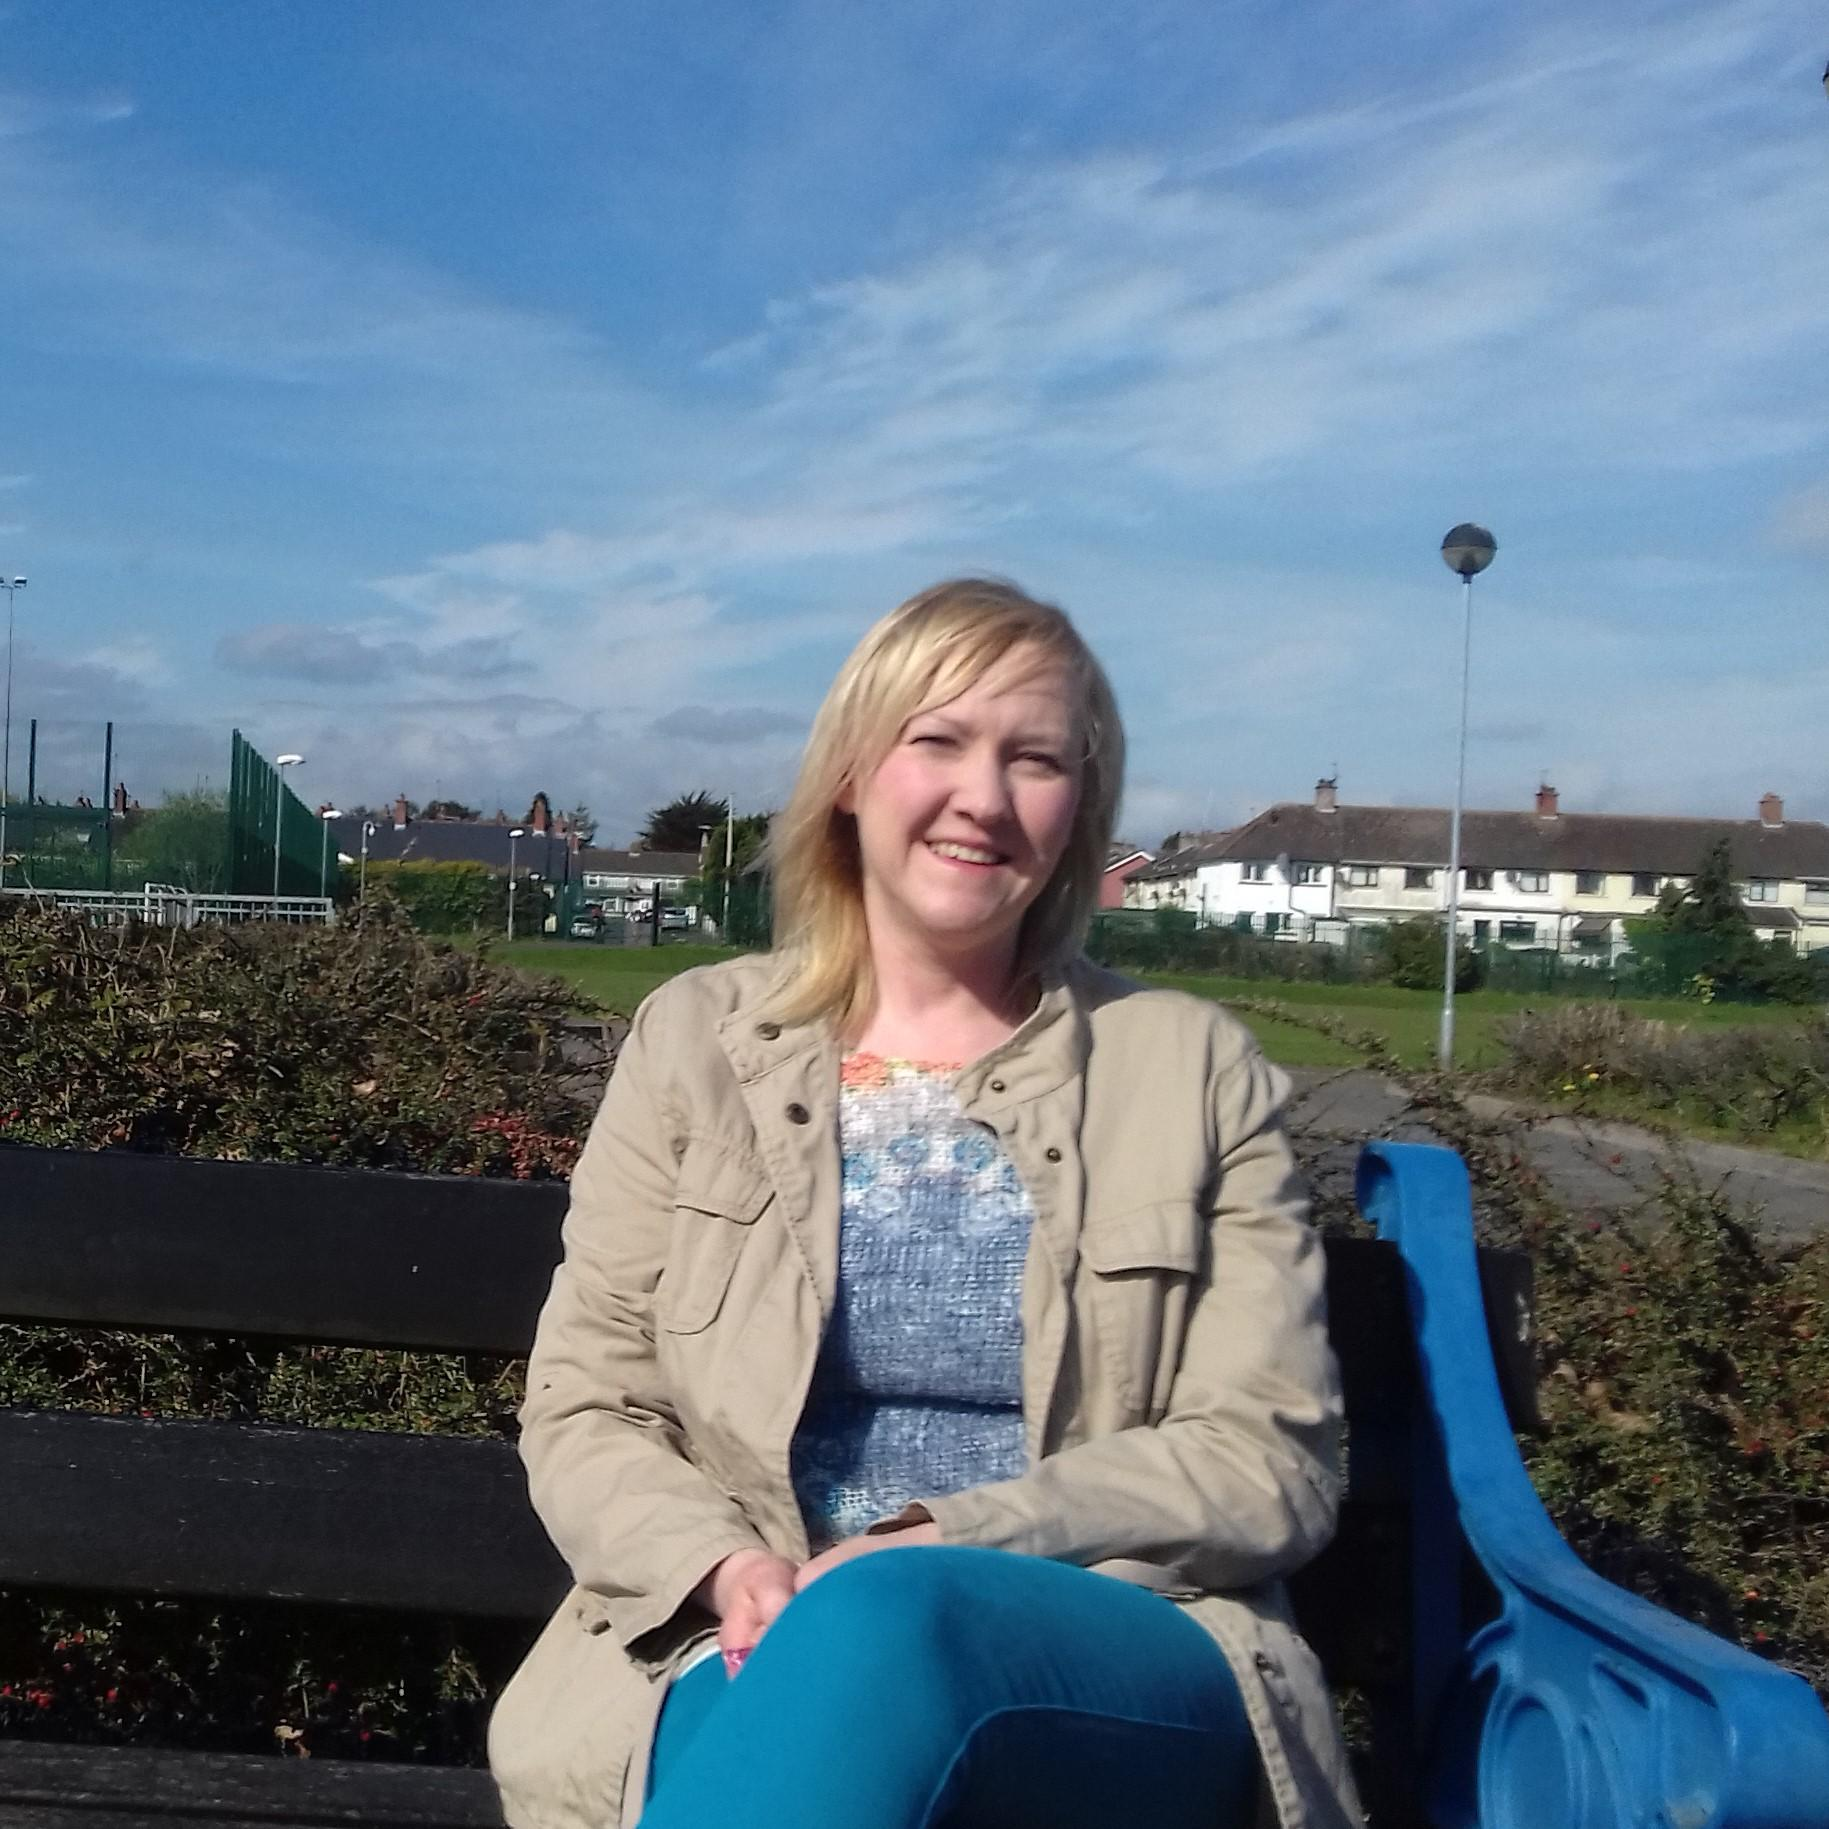 Alison Cathcart, Ladies Study Fellowship